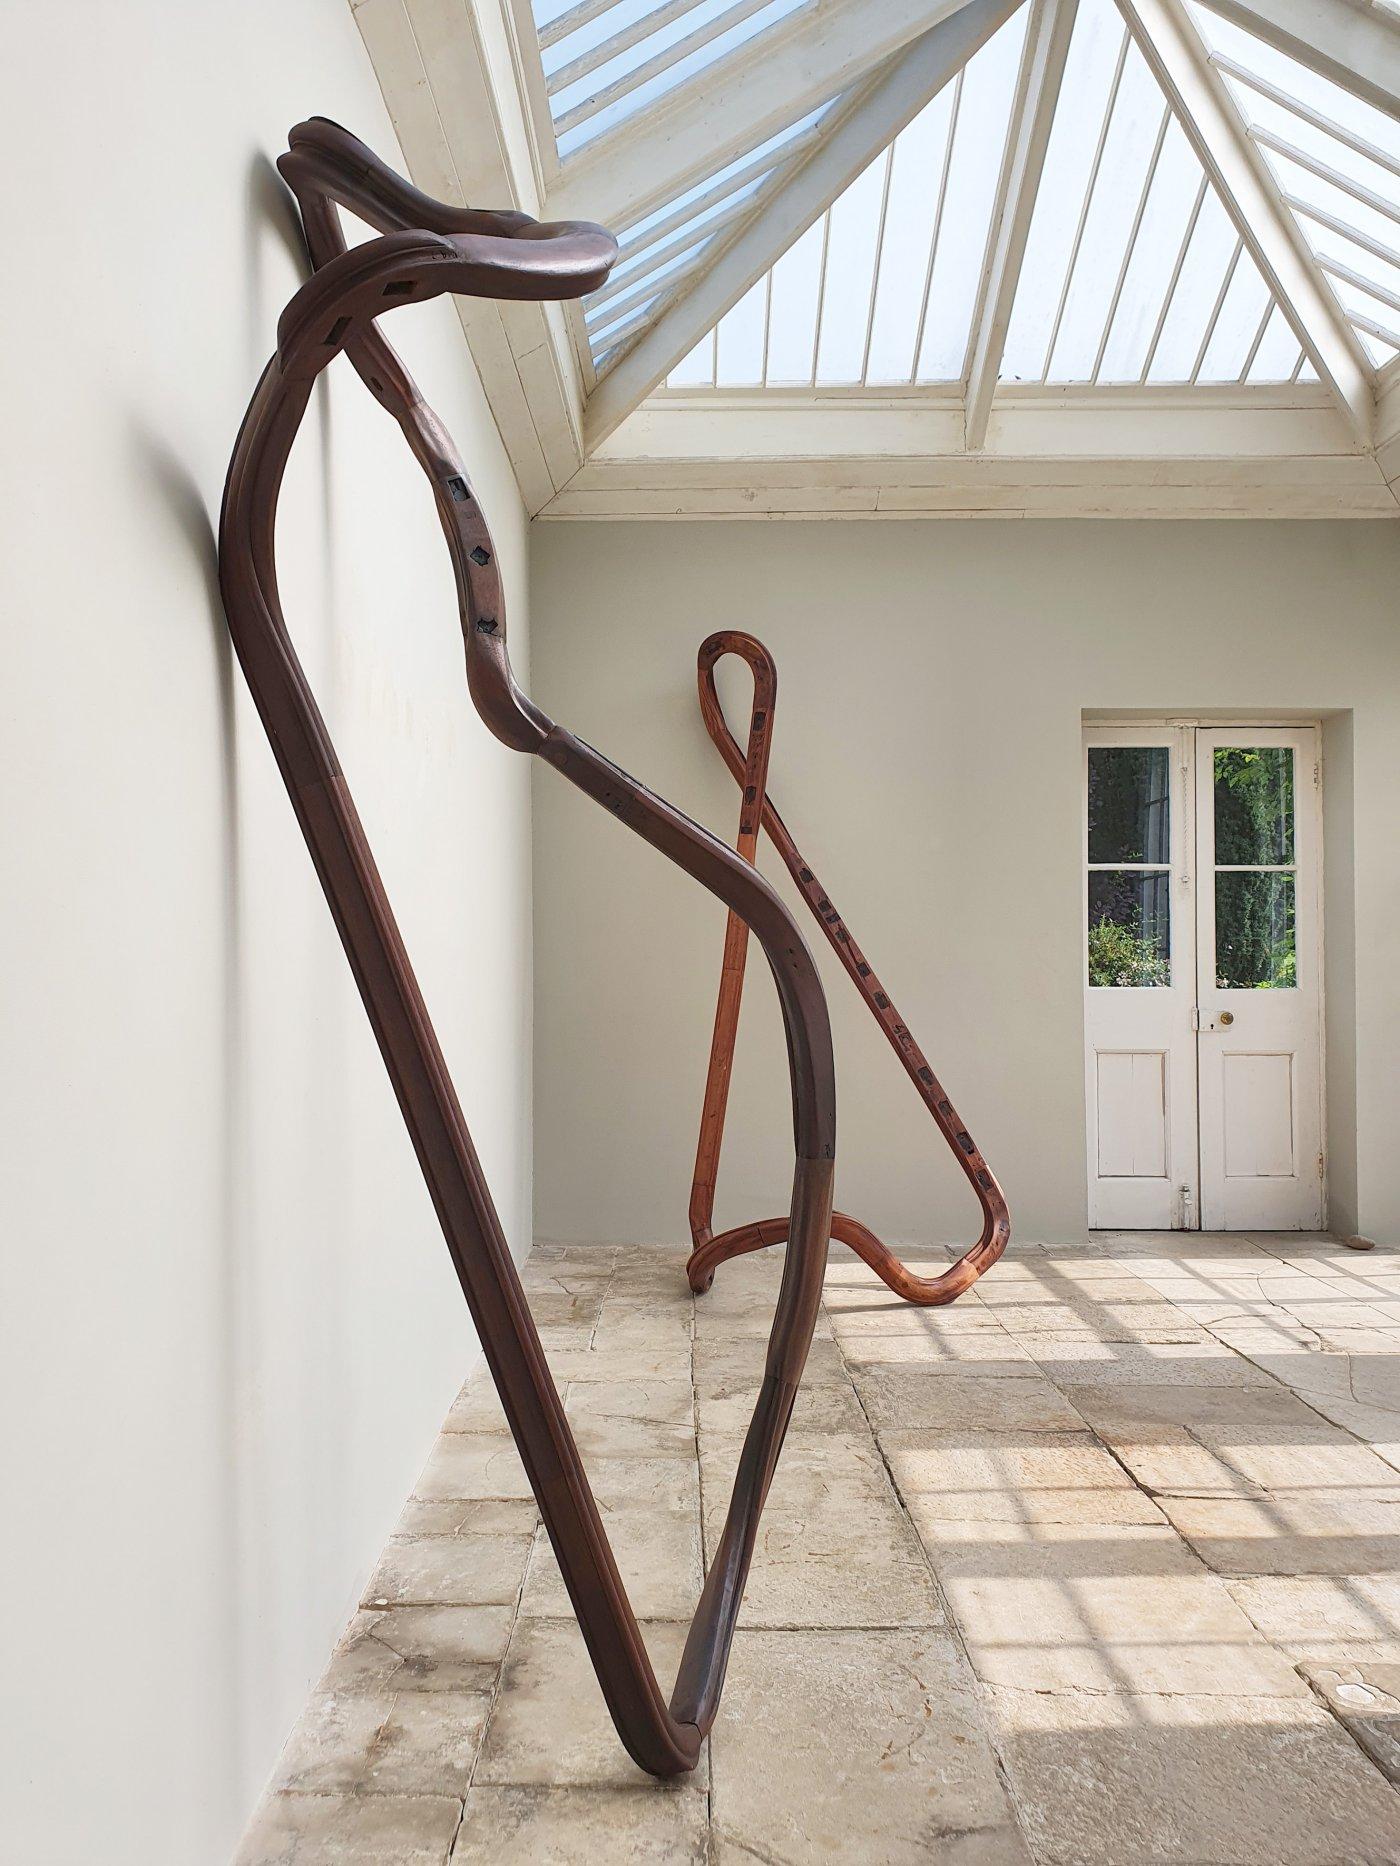 New Art Centre Edward Allington Nika Neelova 8